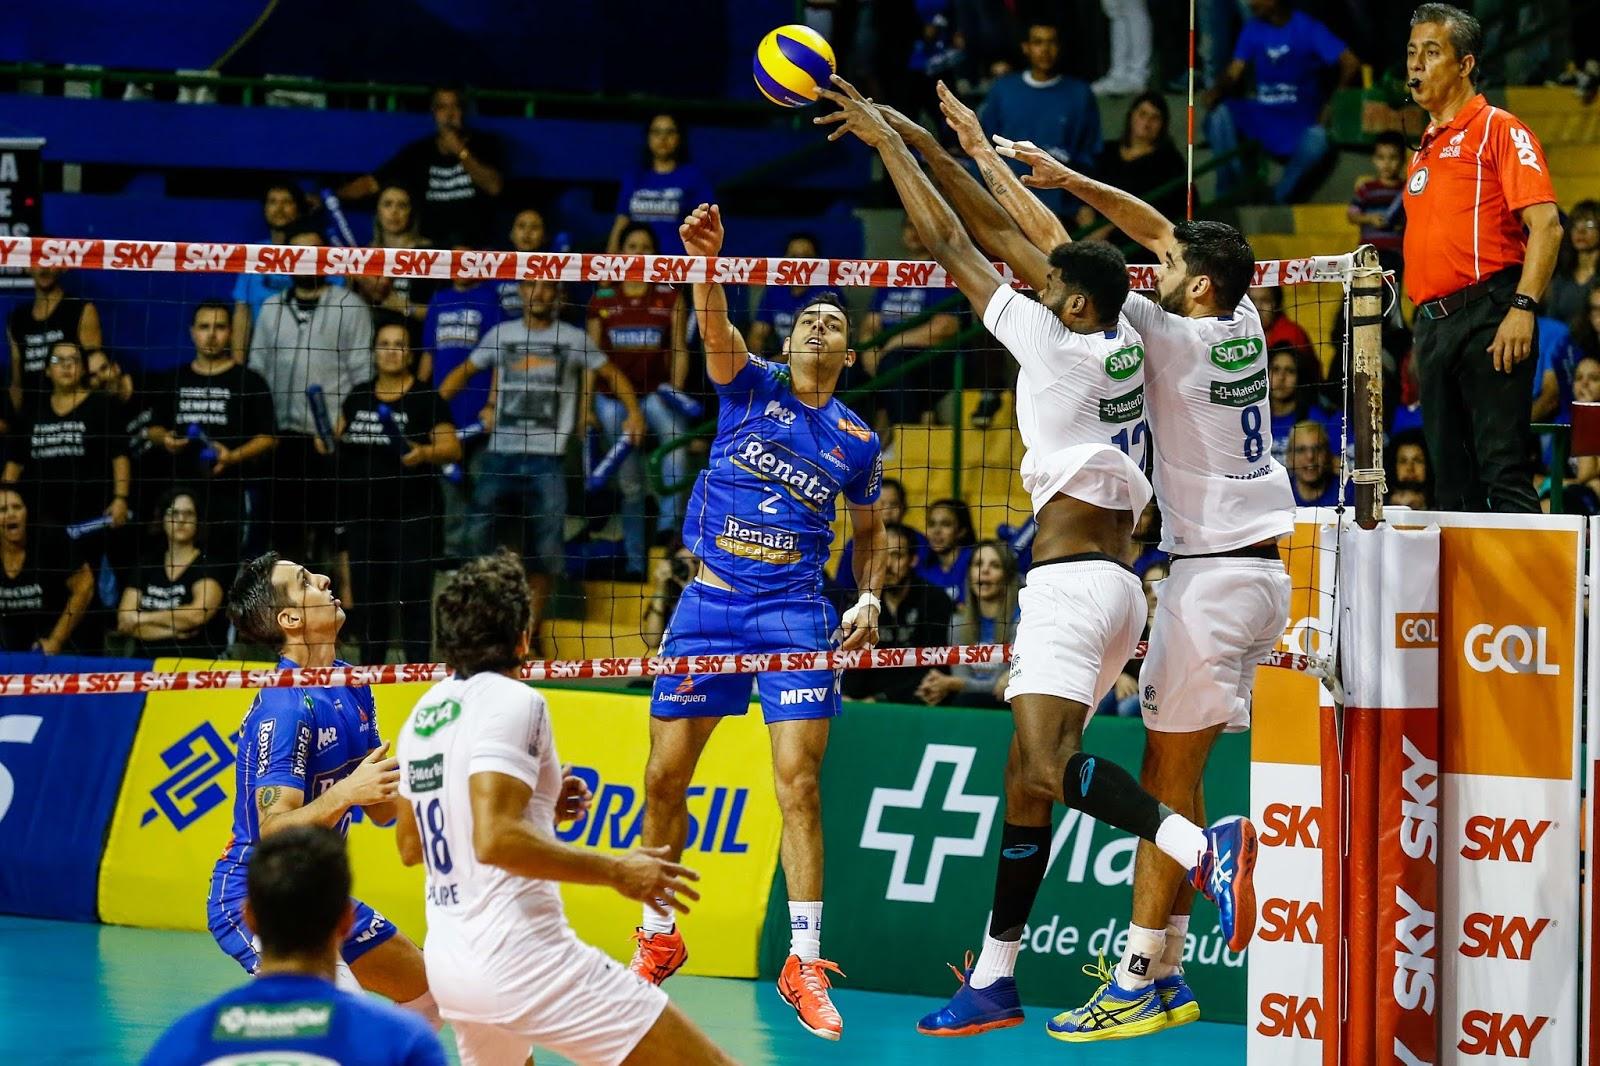 (Superliga) Vôlei Renata supera Sada Cruzeiro na partida de abertura 736d69927965f